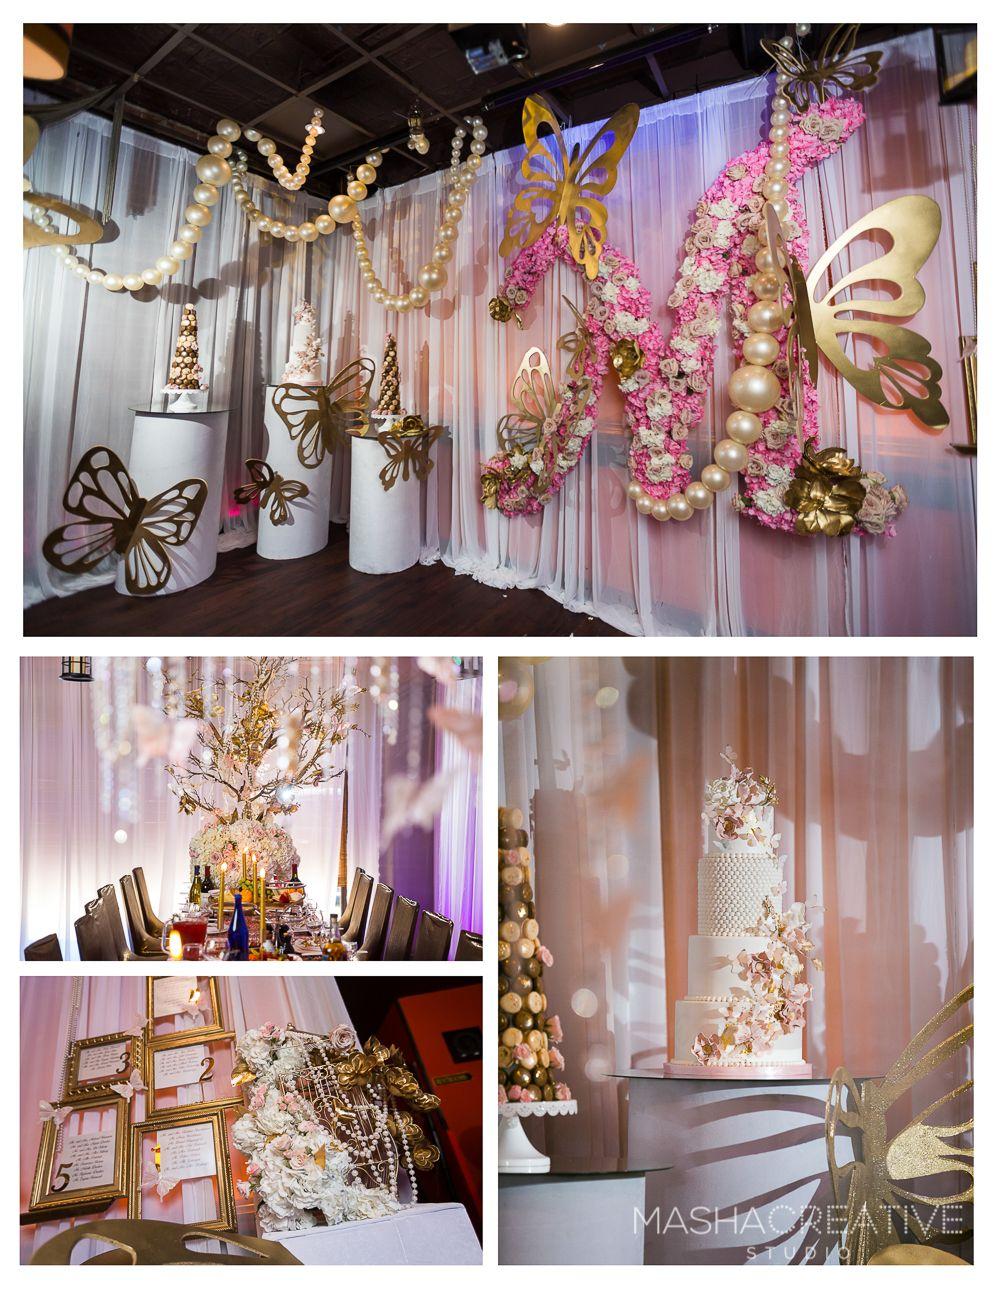 Butterfly 1st Birthday Godik In Brooklyn Mashacreative Com Butterfly 1st Birthday Birthday Decorations 1st Birthday